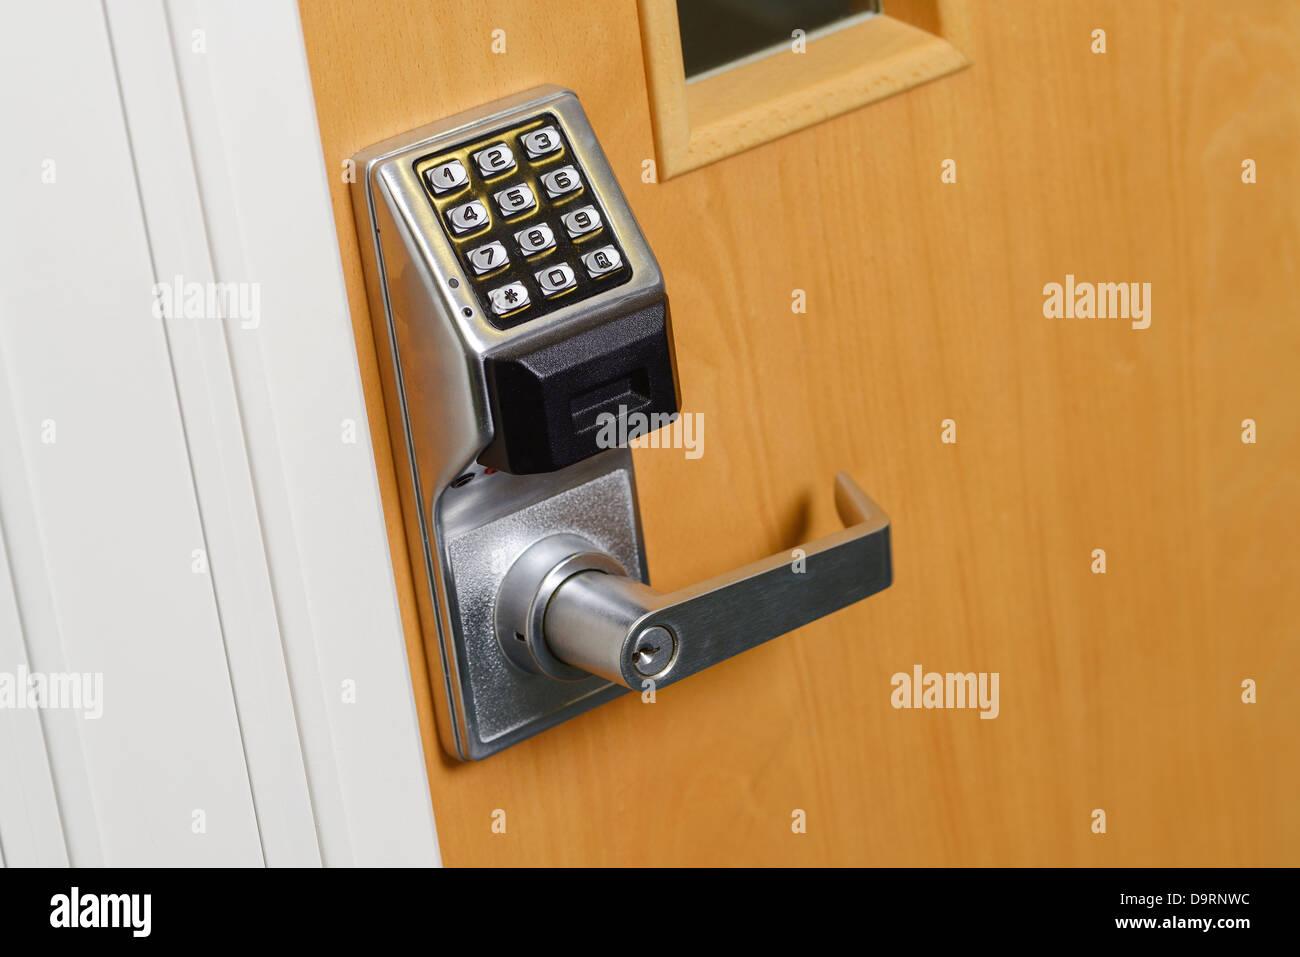 Teclado digital office la manija de la puerta Imagen De Stock